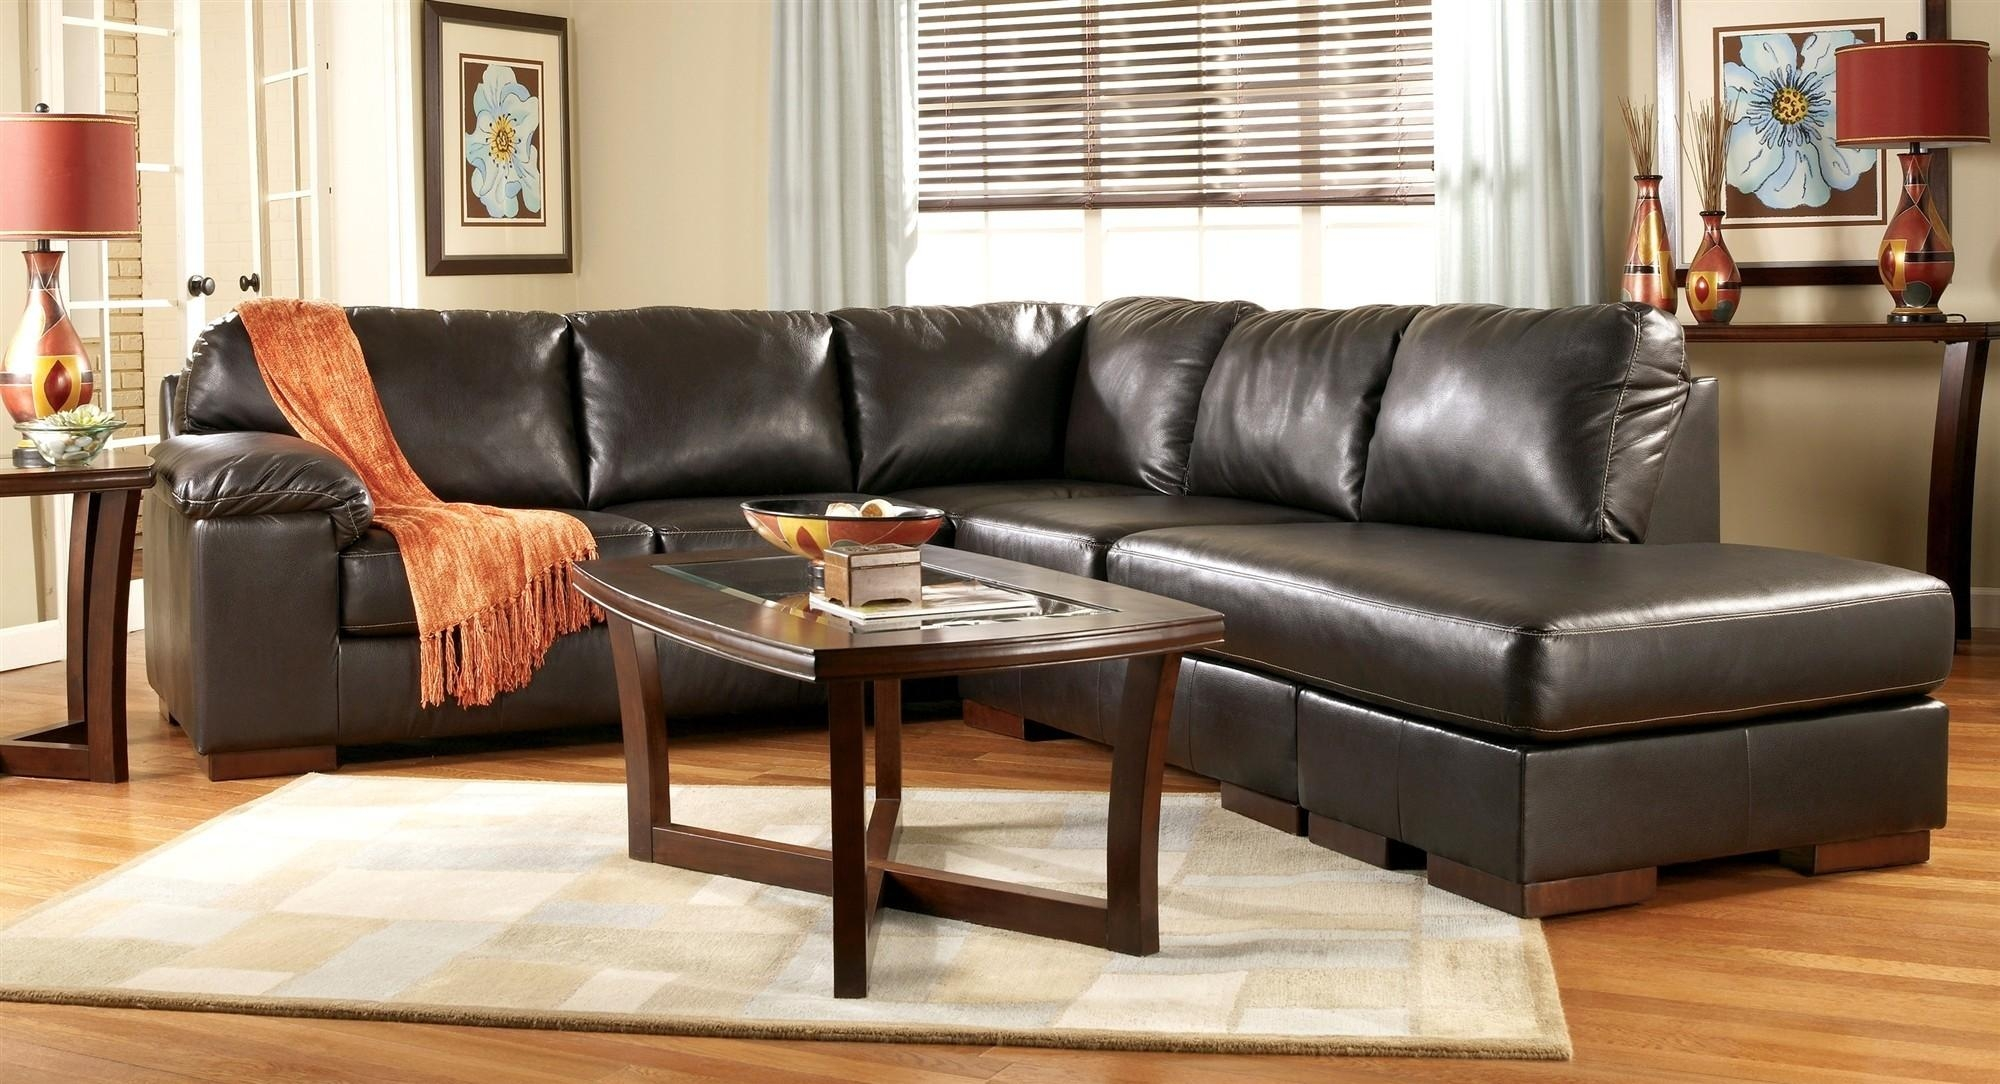 Living Room Design Ideas Brown Leather Sofa Lavita Home (Image 12 of 20)